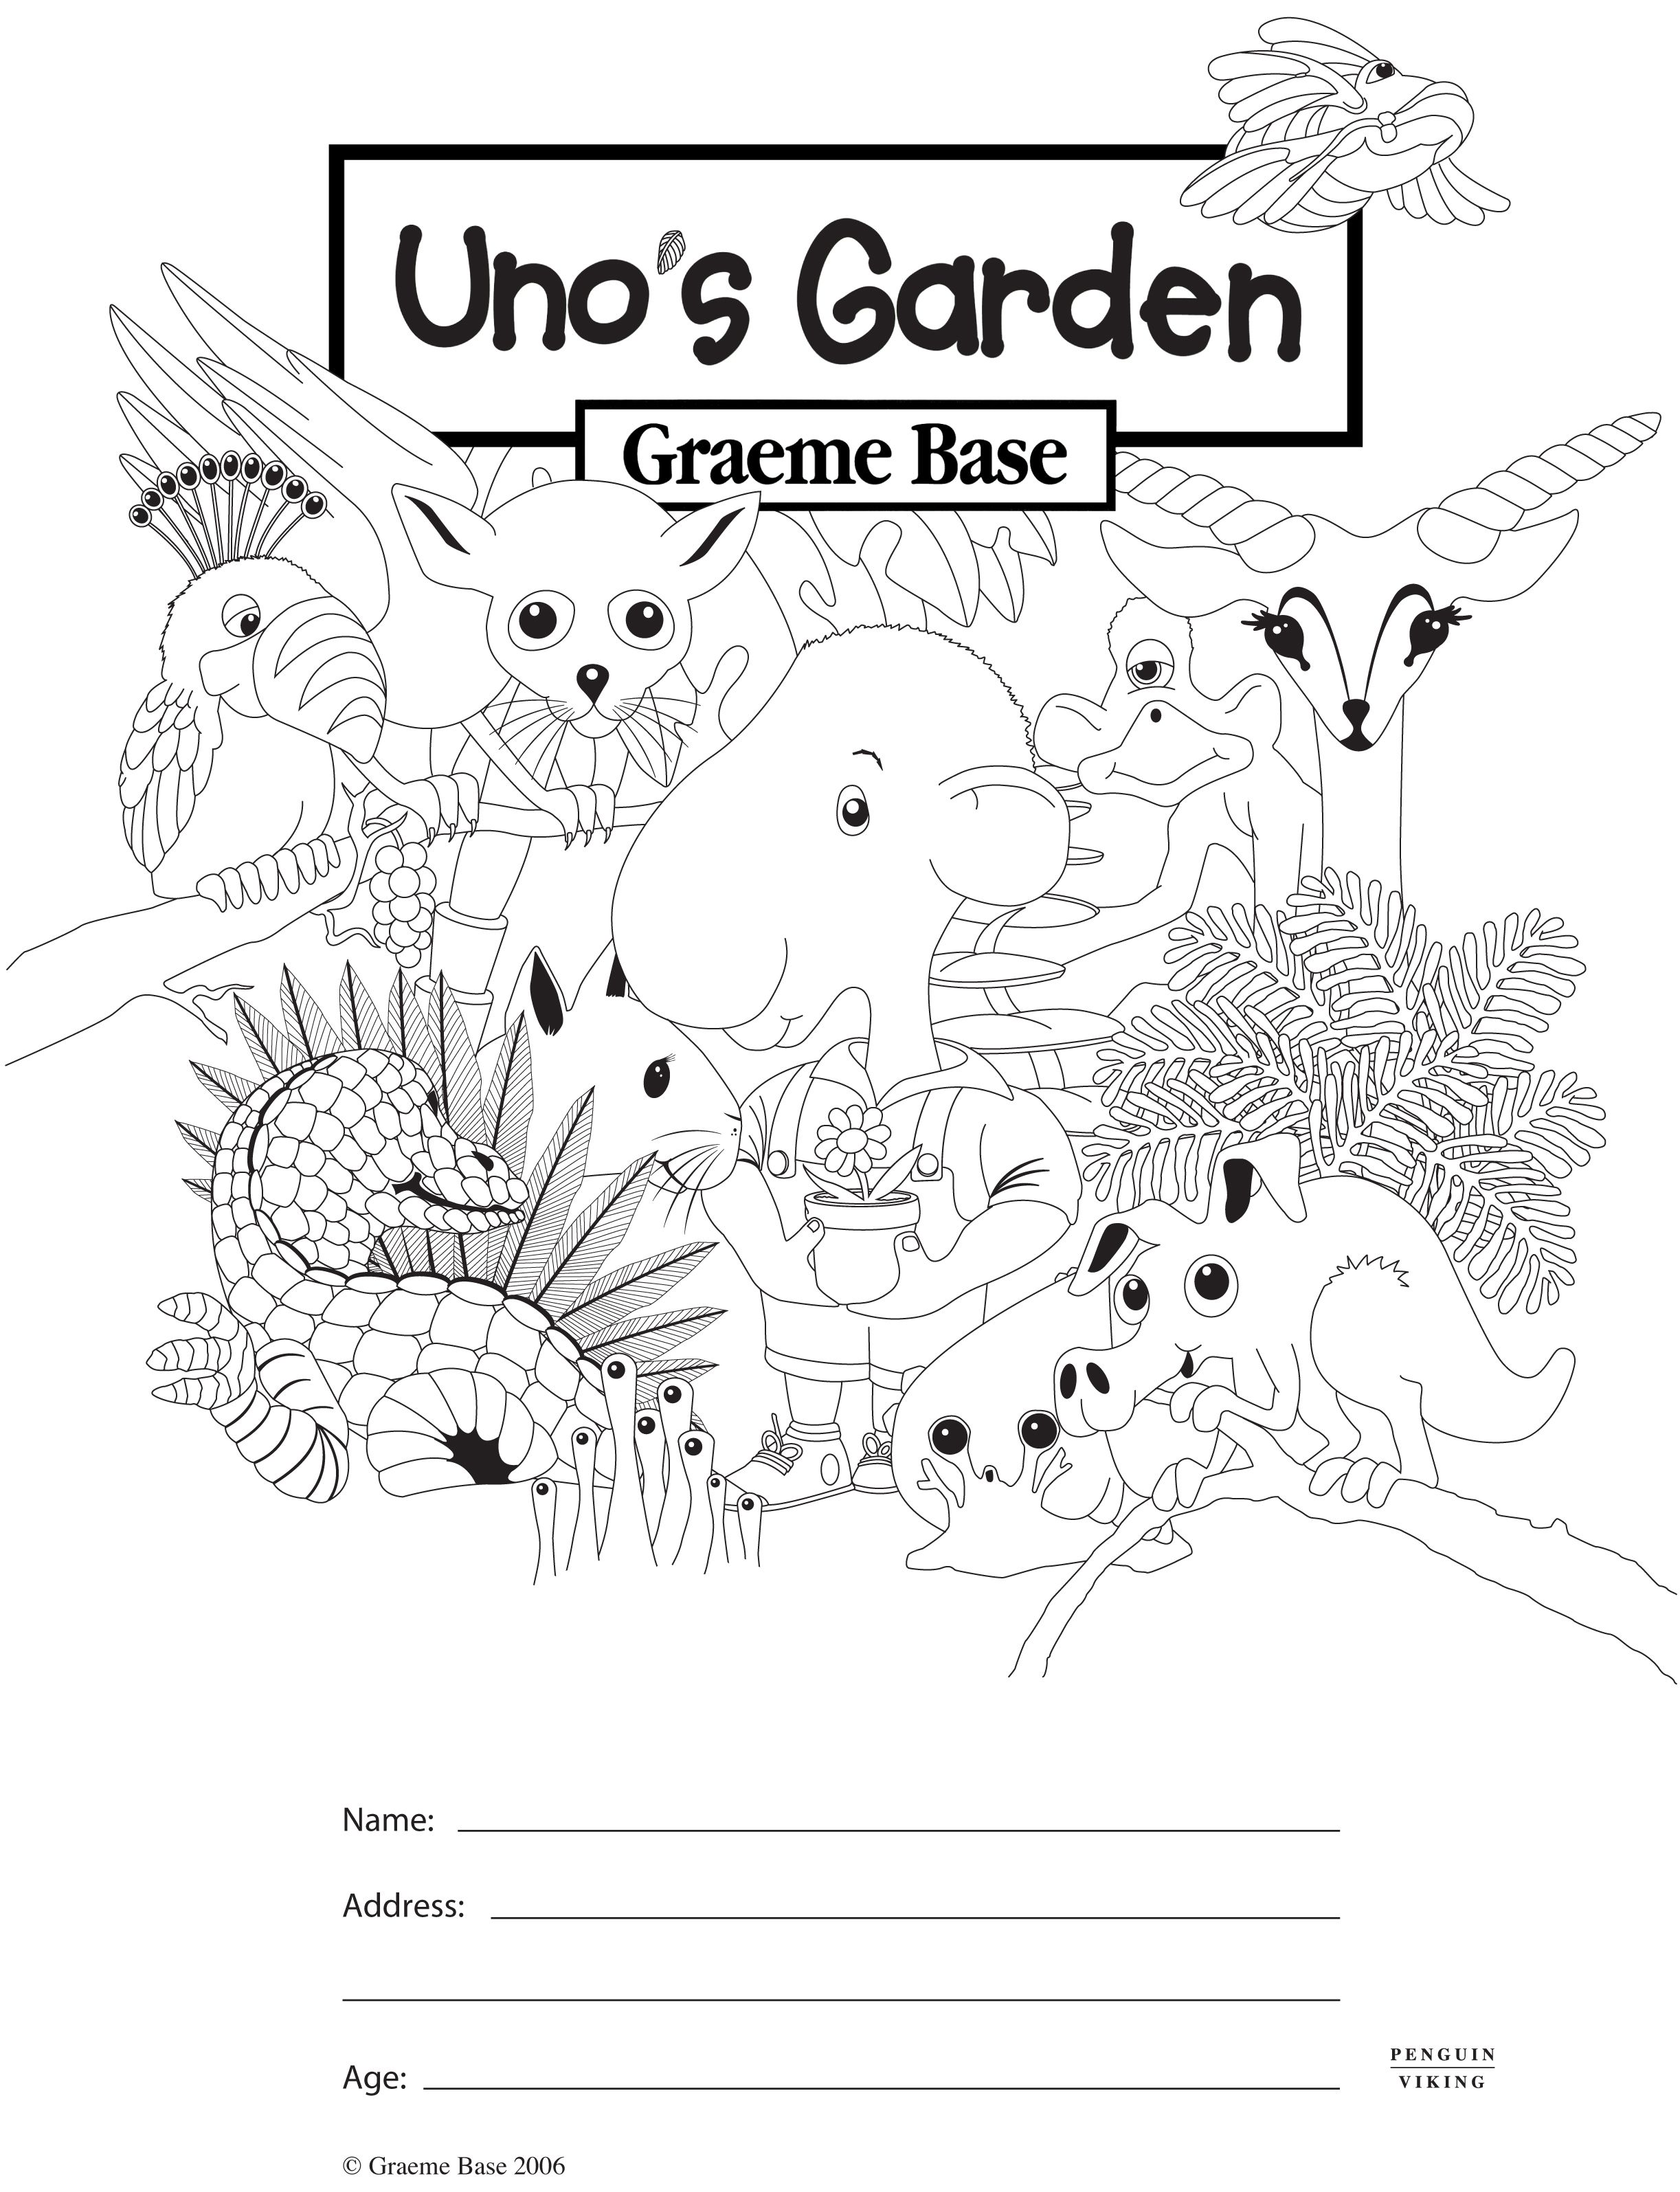 Uno S Garden Colouring In Puffin Files